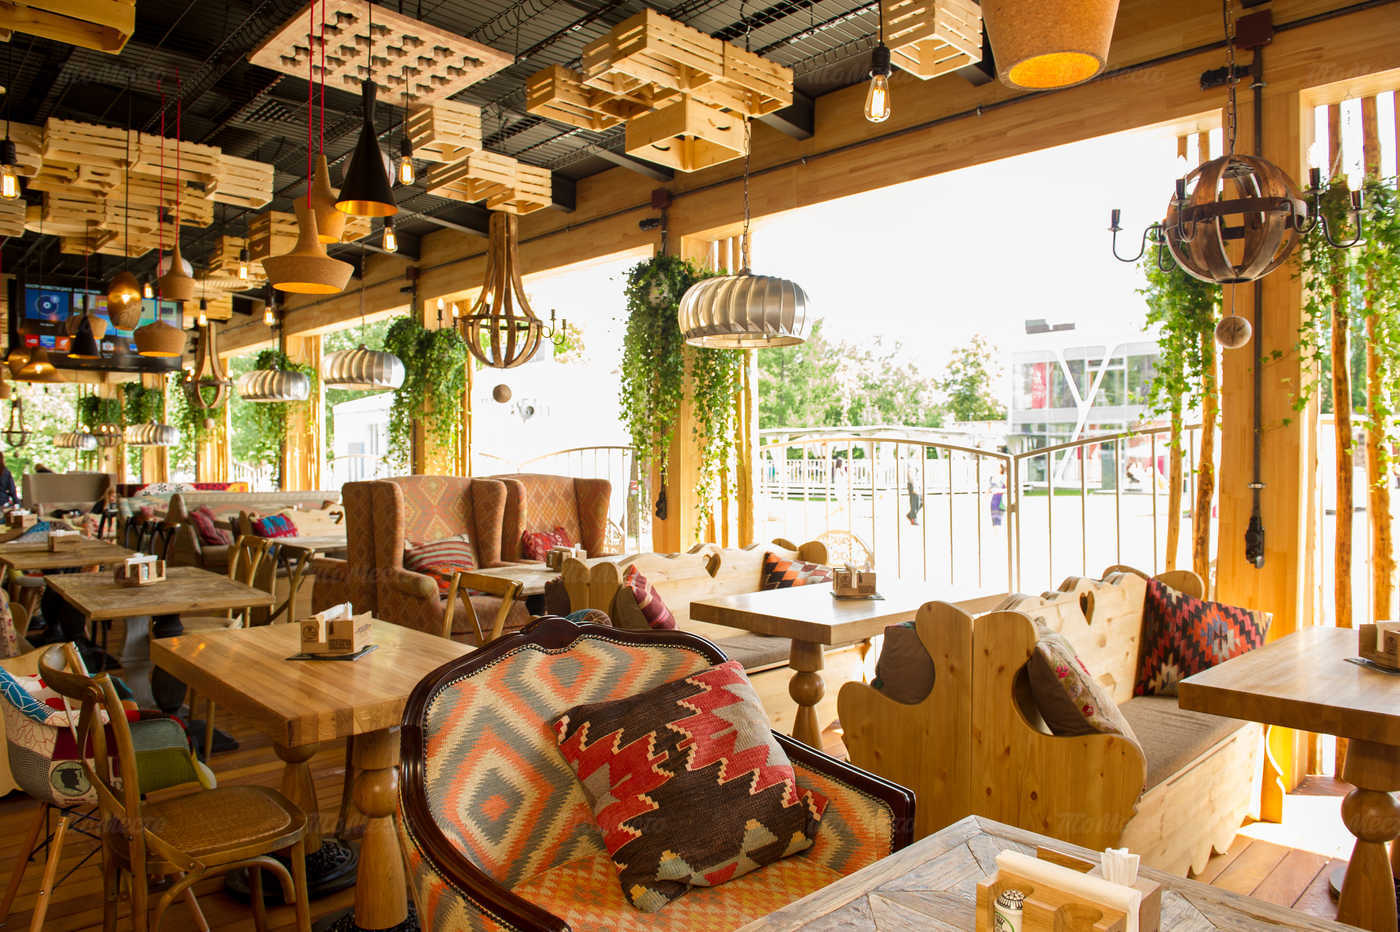 Банкеты ресторана FOOD BAZAR (Фуд базар) на улице Каретный Ряд фото 17